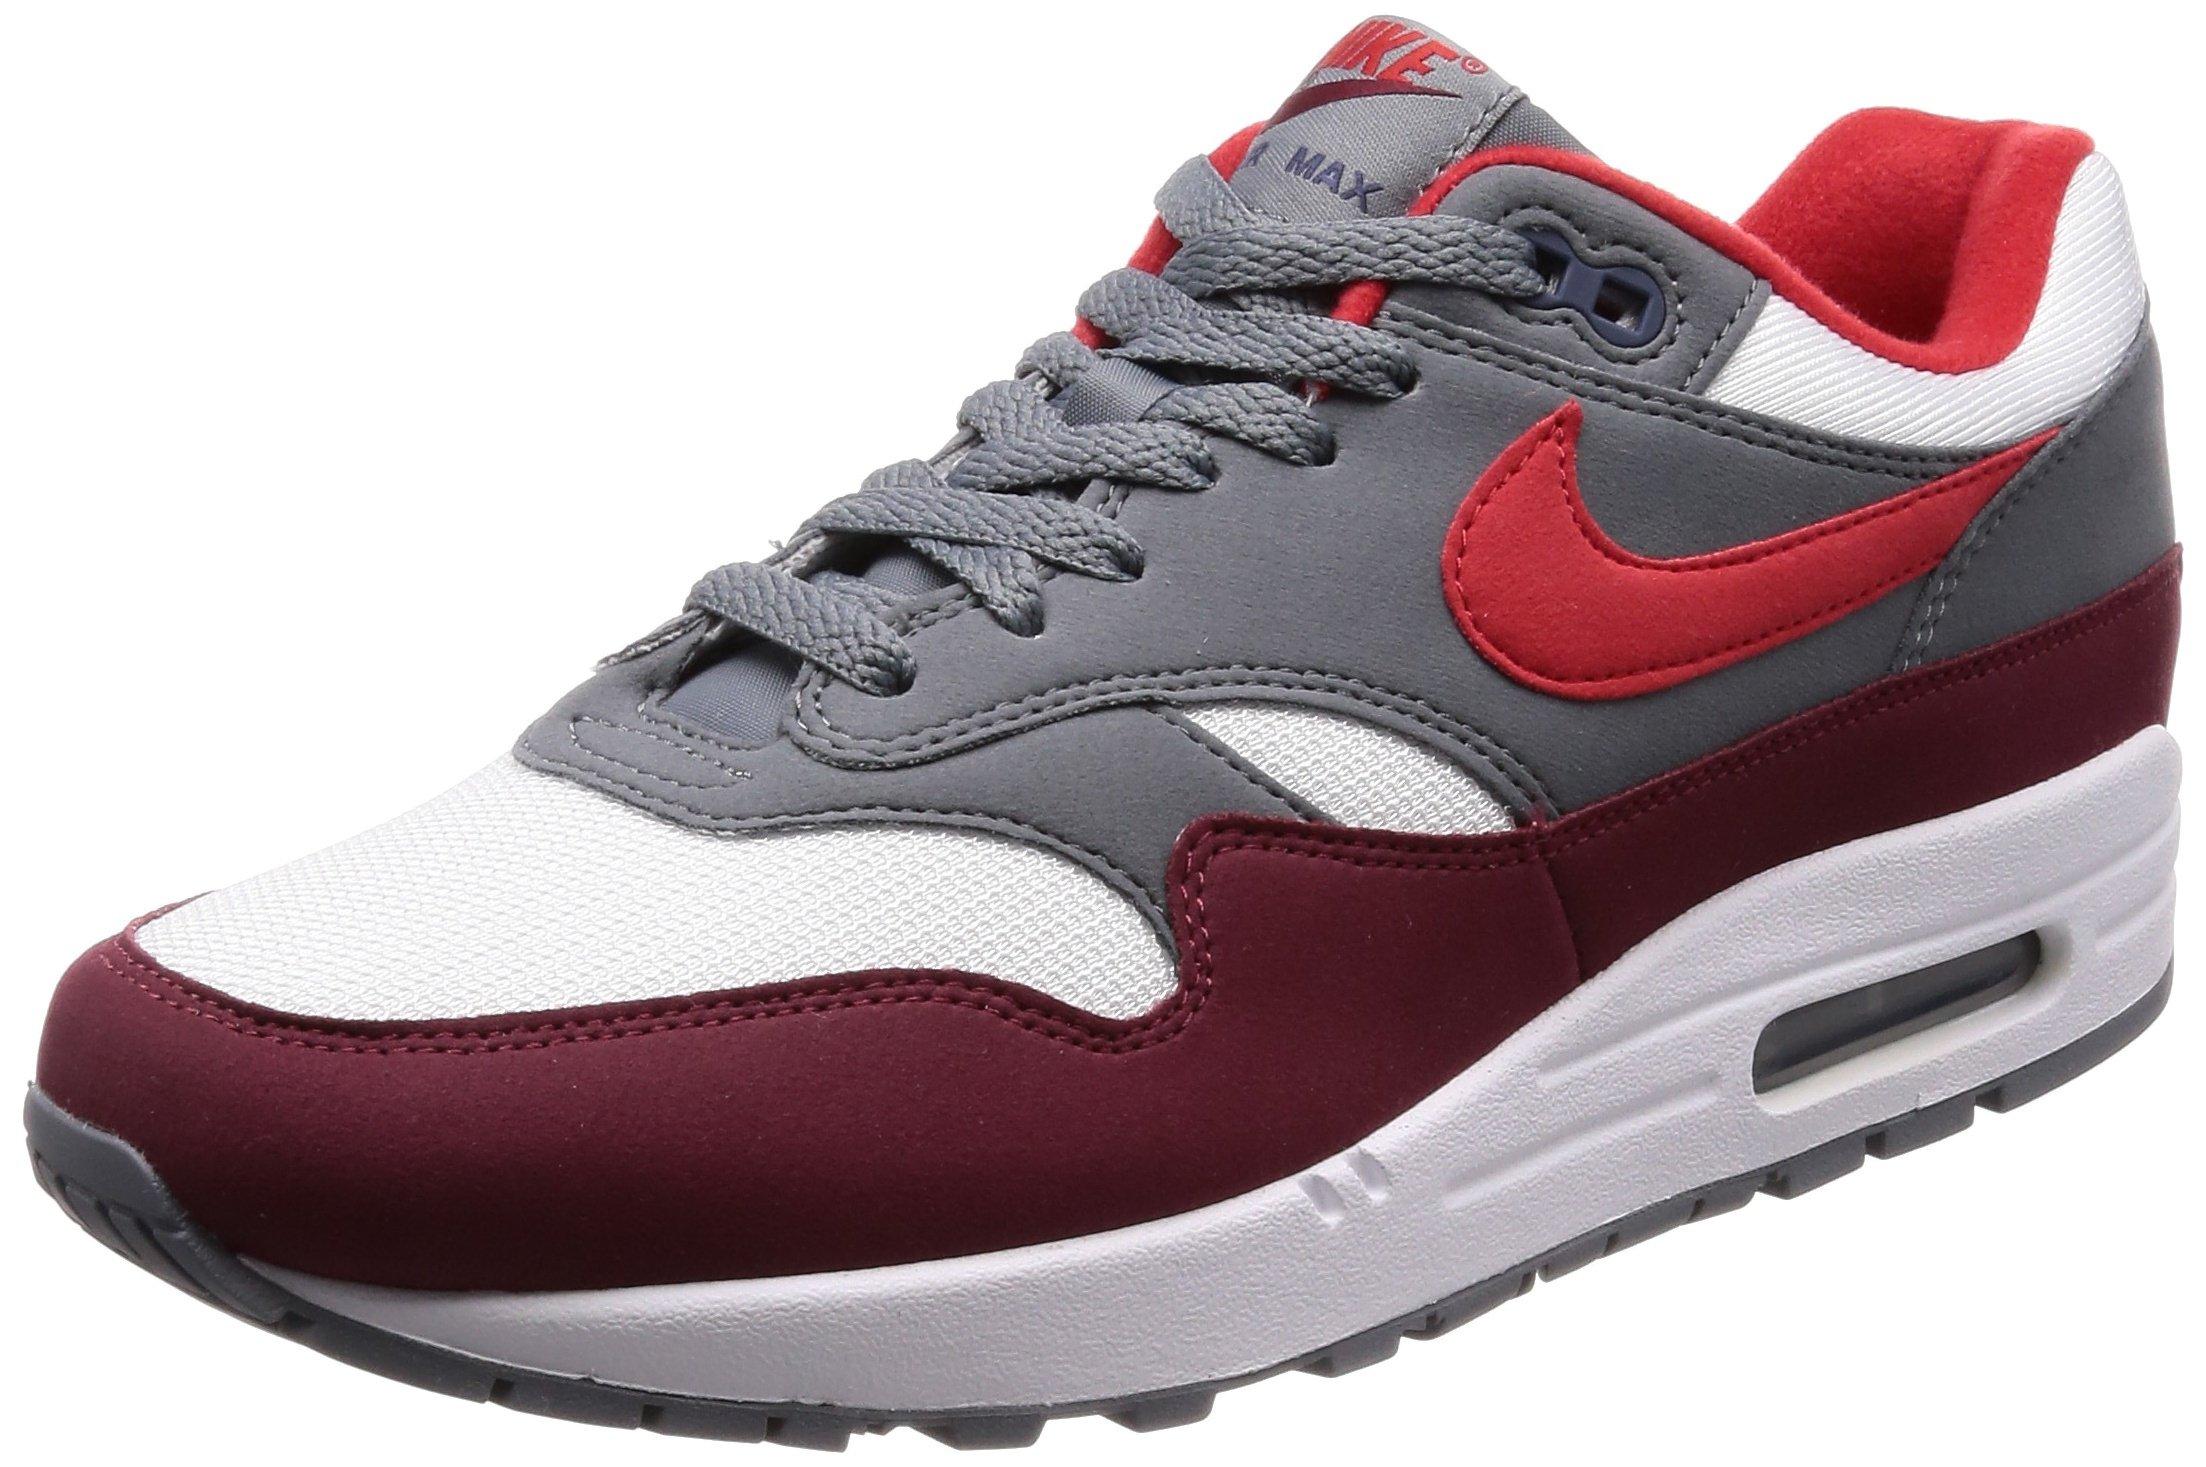 d945b23e512a2 NIKE Men's AIR MAX 1 Shoe White/University RED/Grey | Amazon